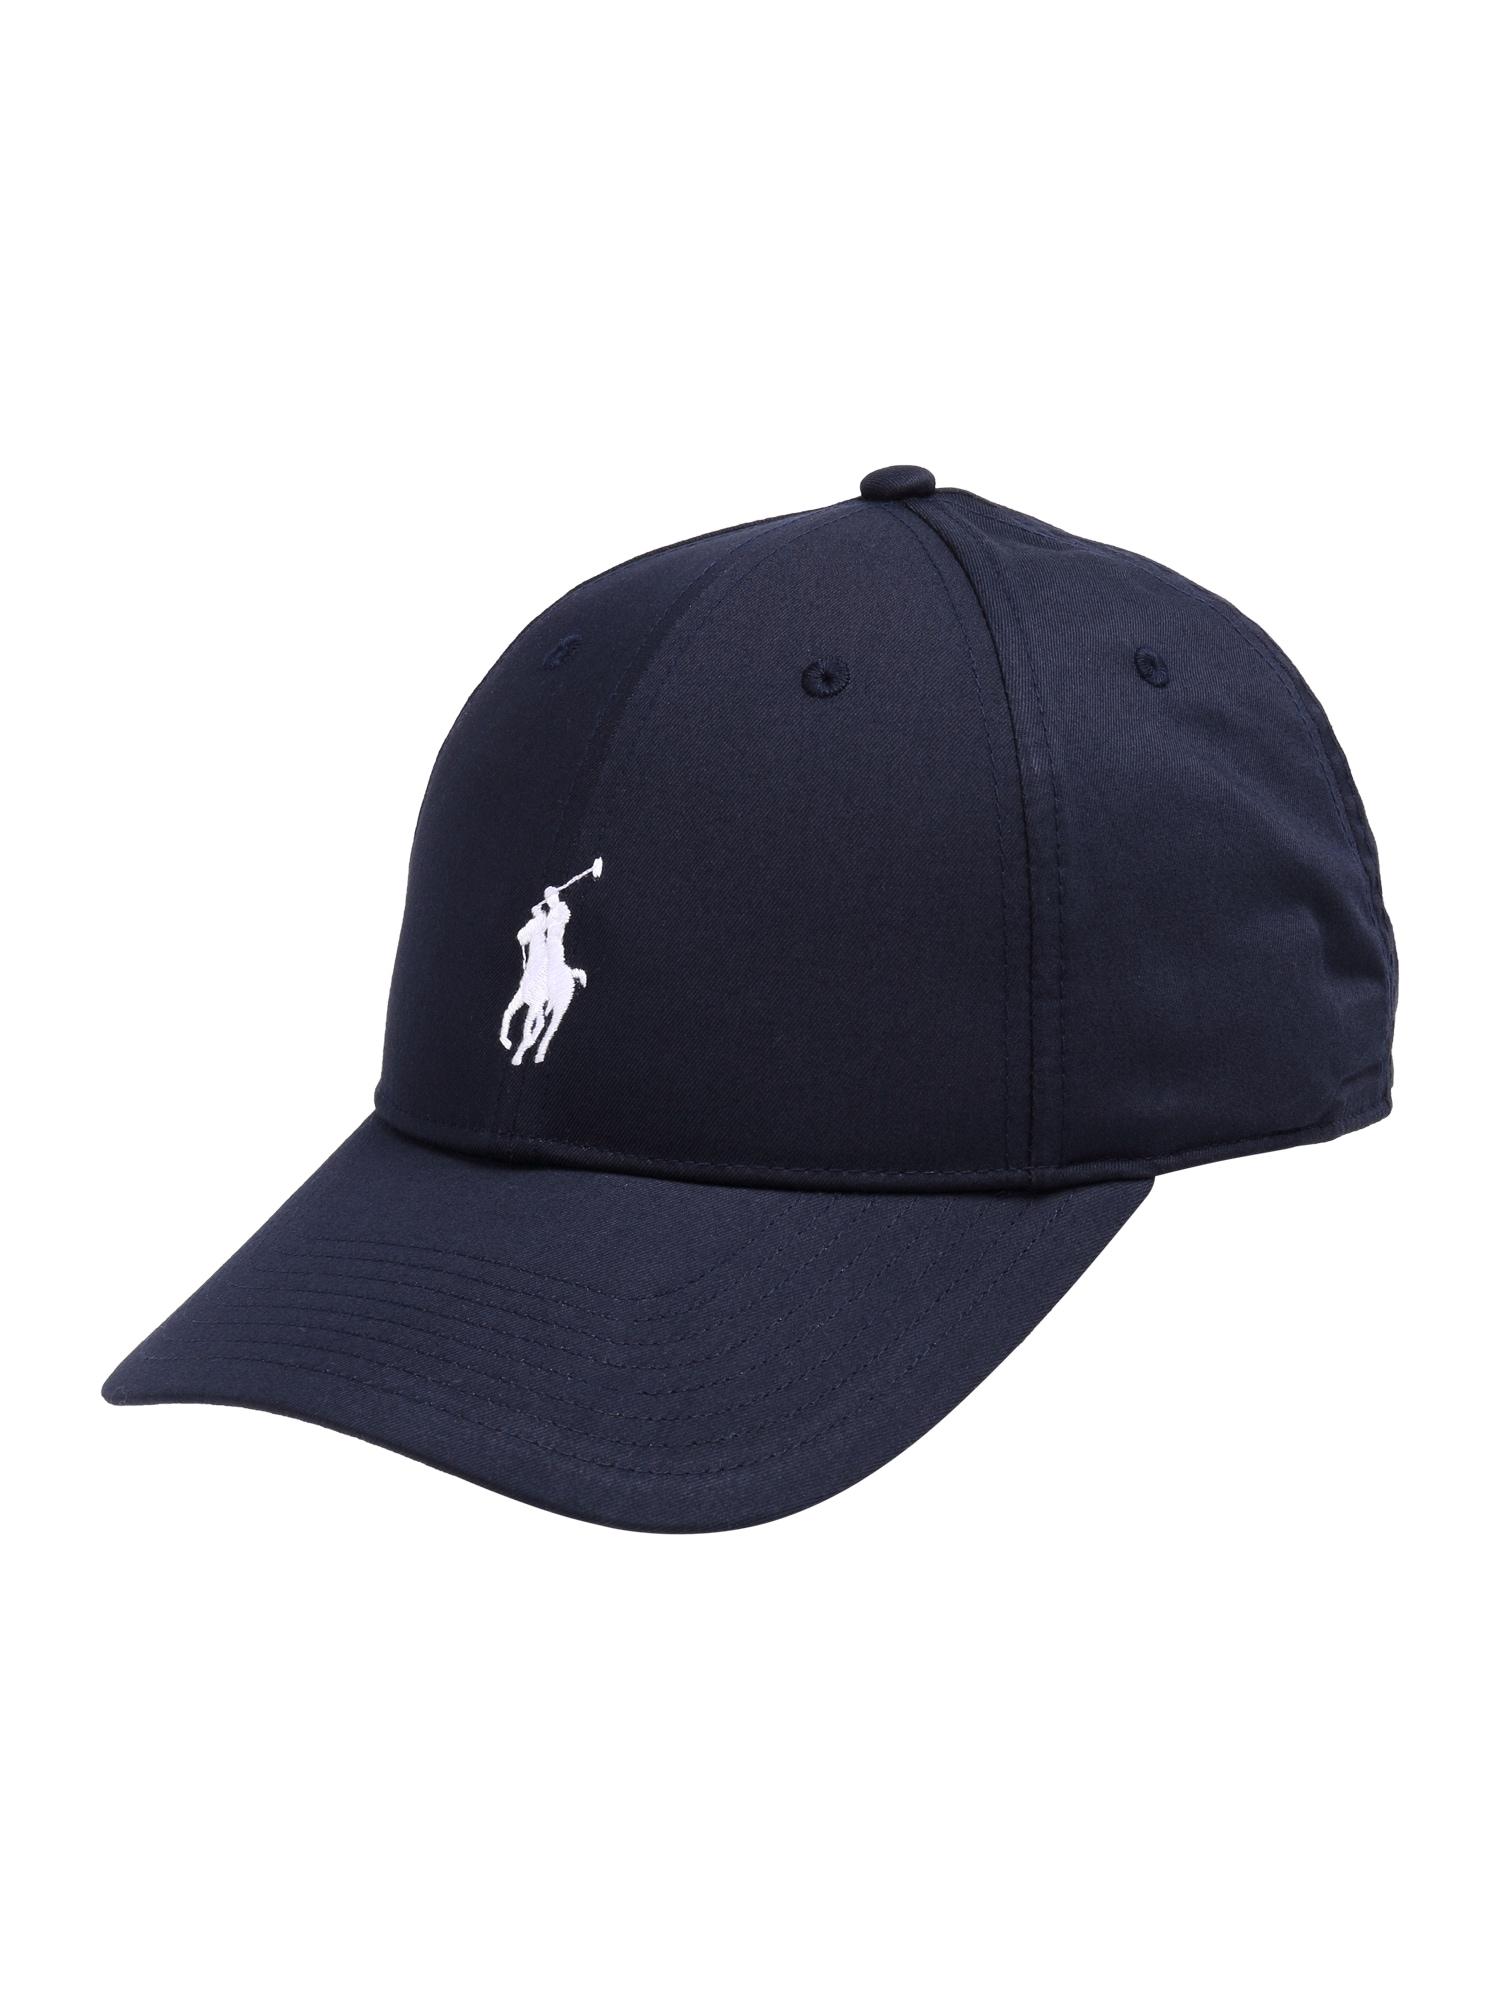 Kšiltovka BASELINE CAP modrá POLO RALPH LAUREN